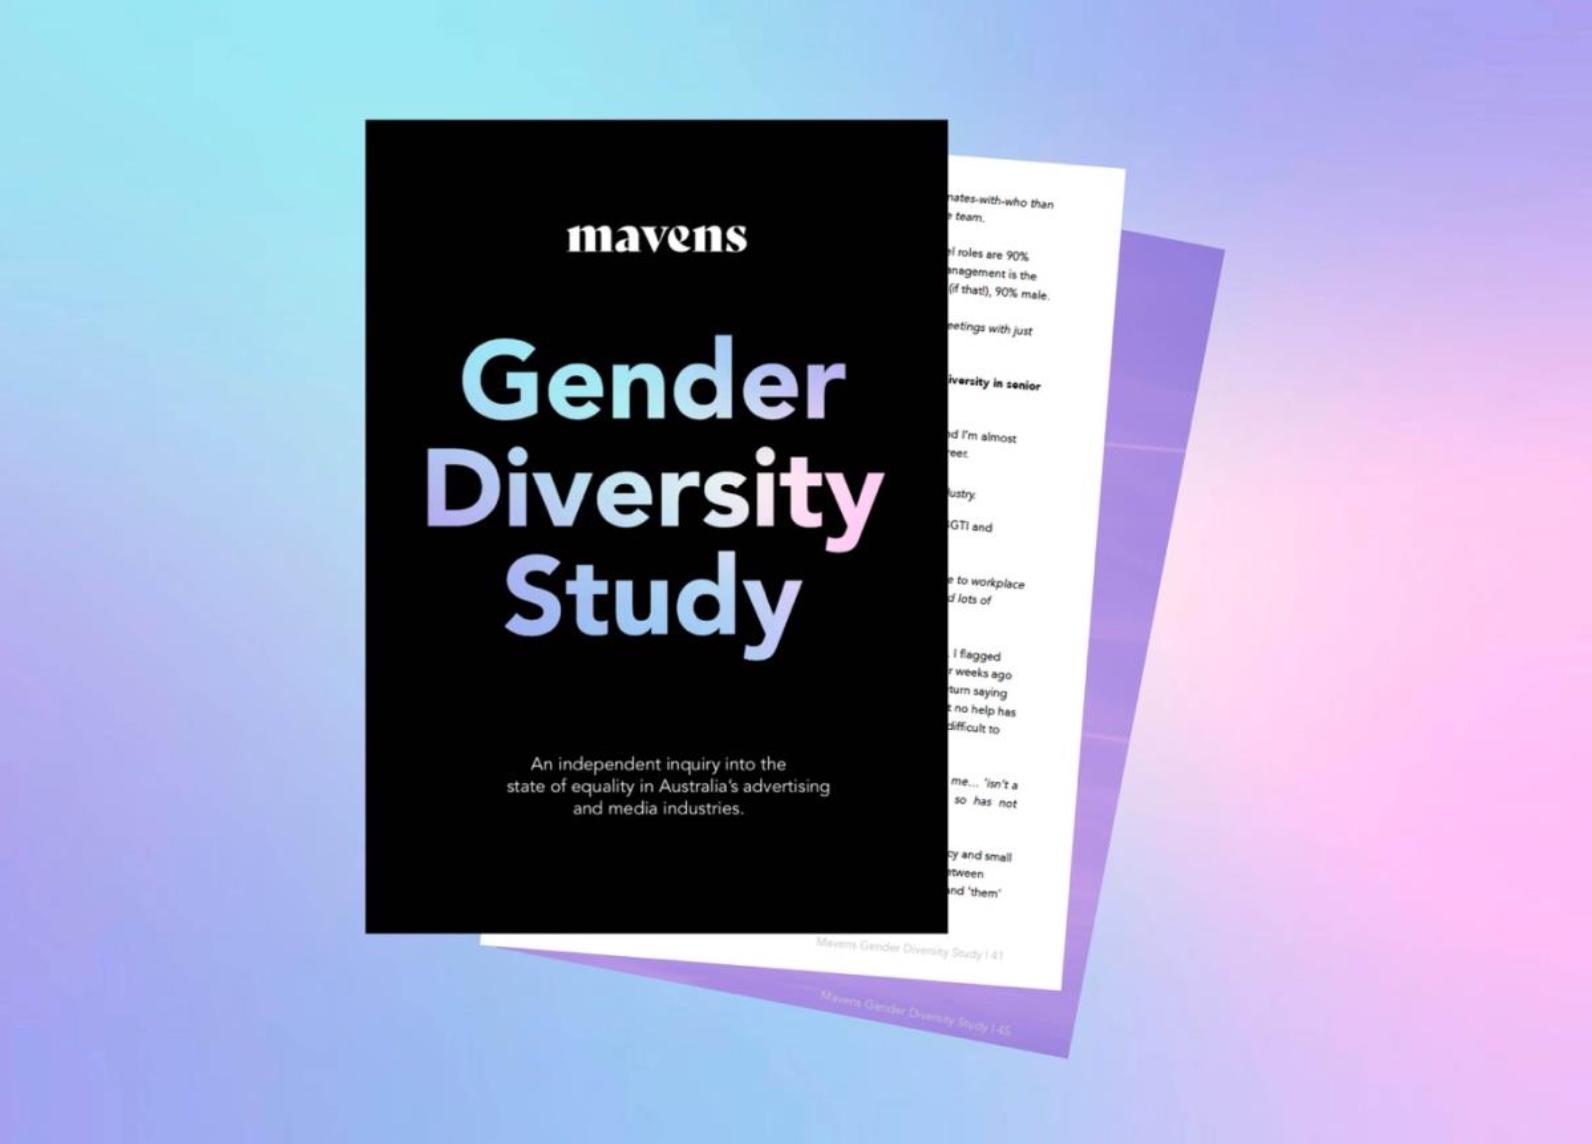 Mavens launches new Gender Diversity report